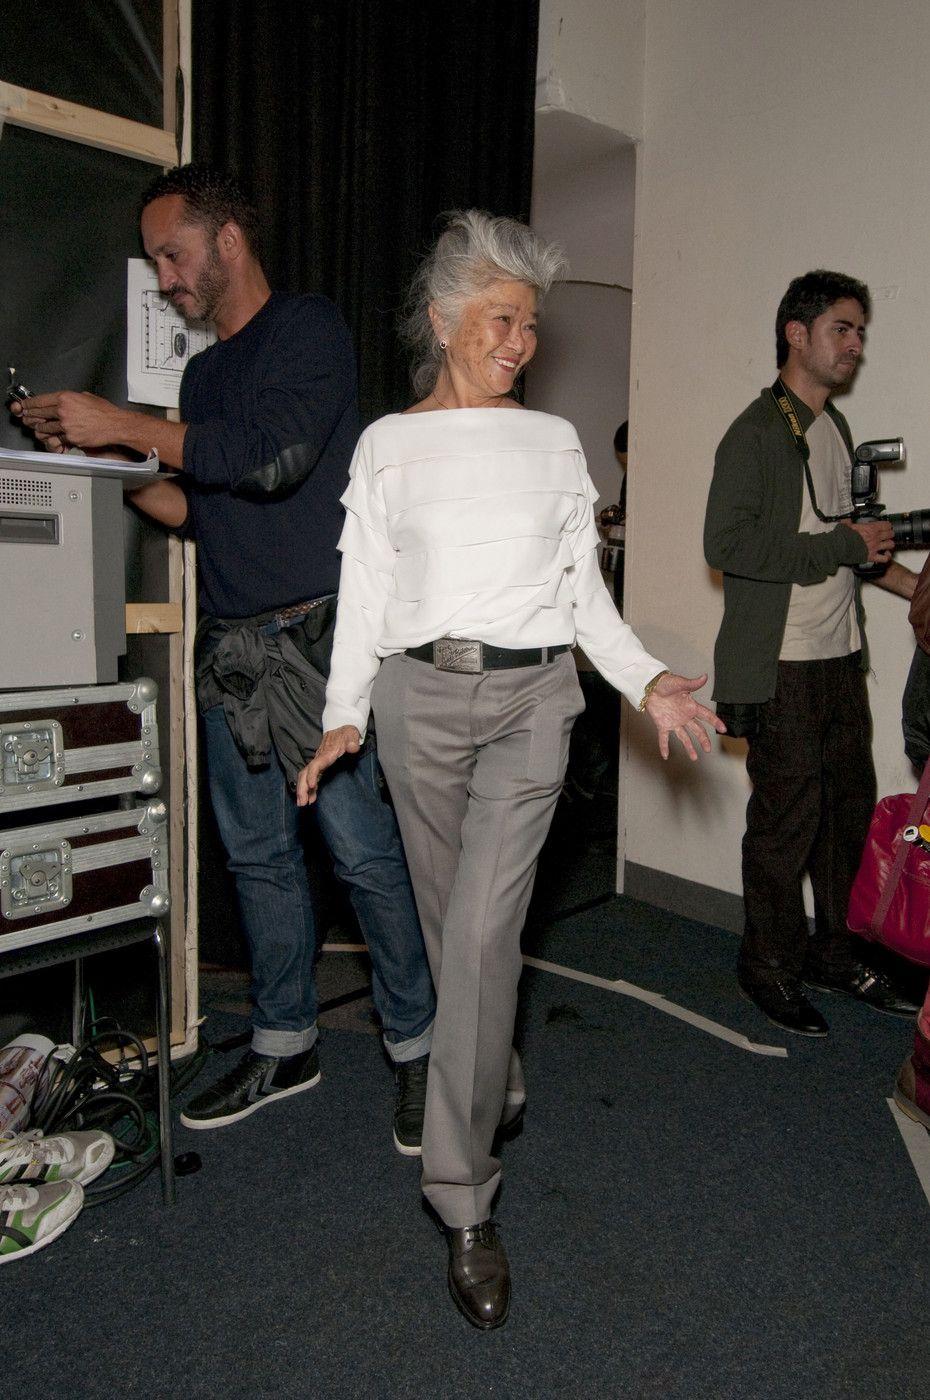 c38d119e0ec Junko Shimada at Paris Fashion Week Spring 2011 - Backstage Runway Photos